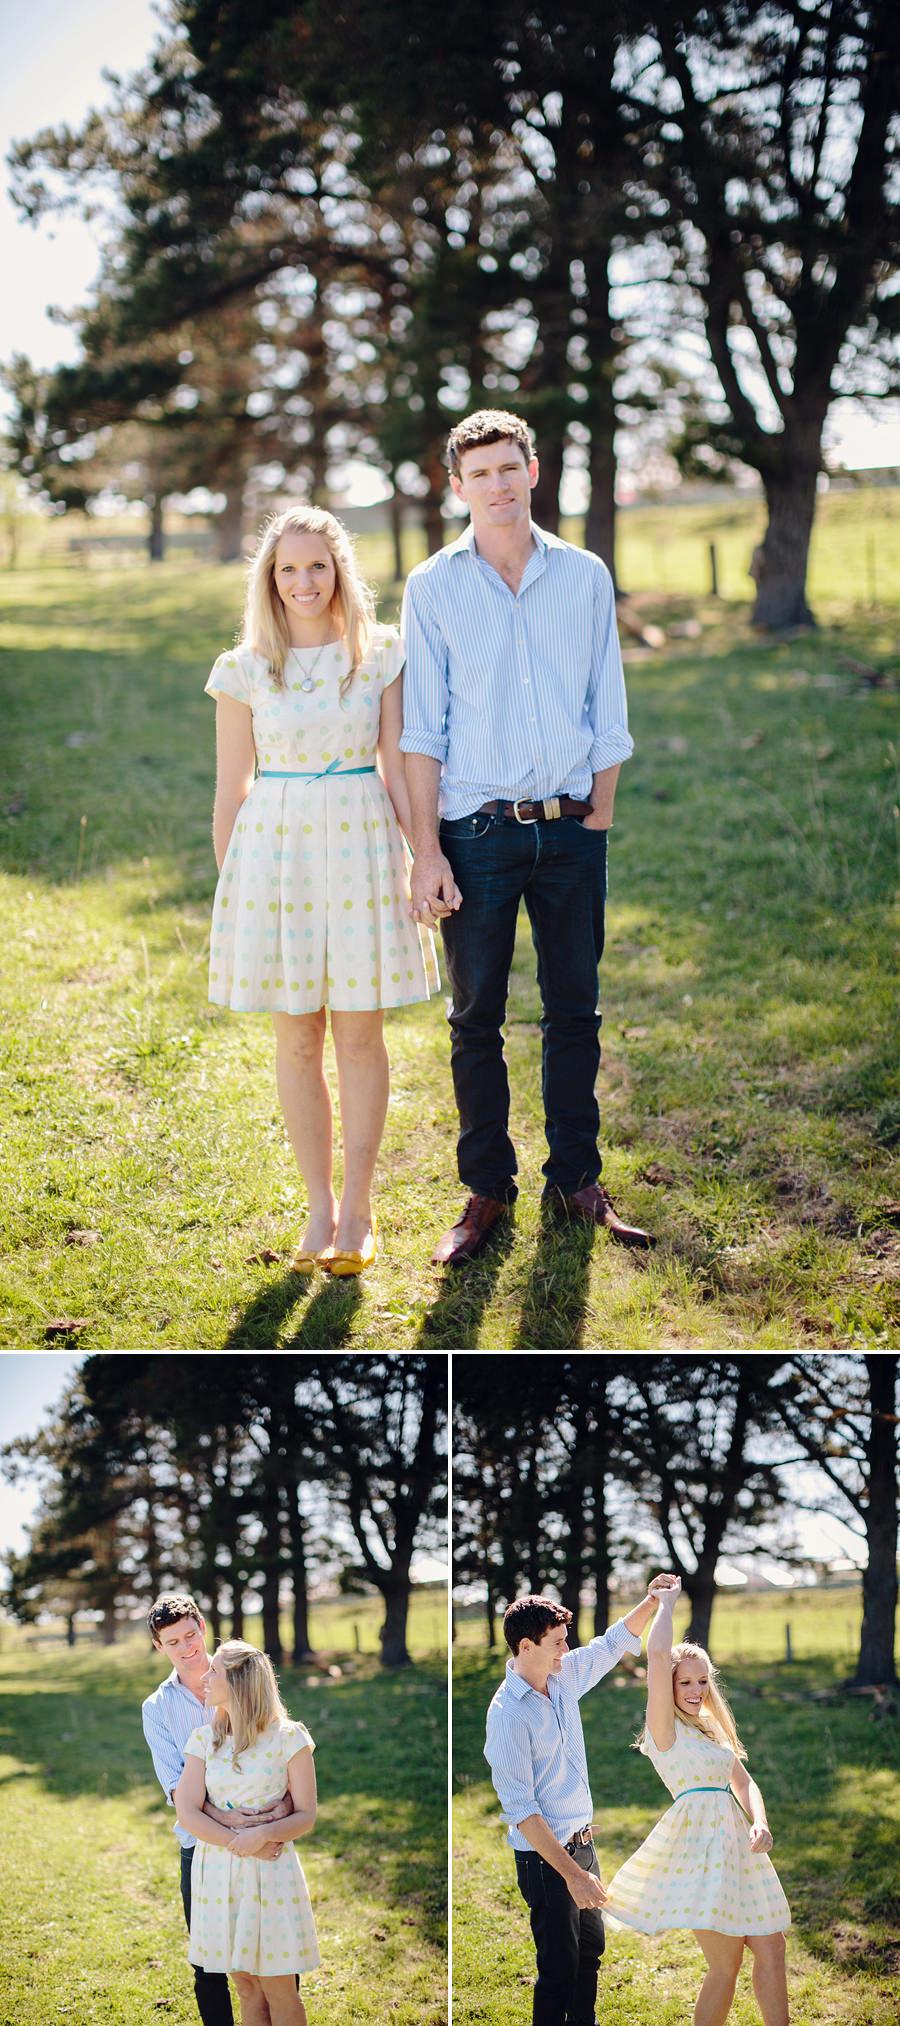 Sofala Wedding Photographer: Pip & Mick